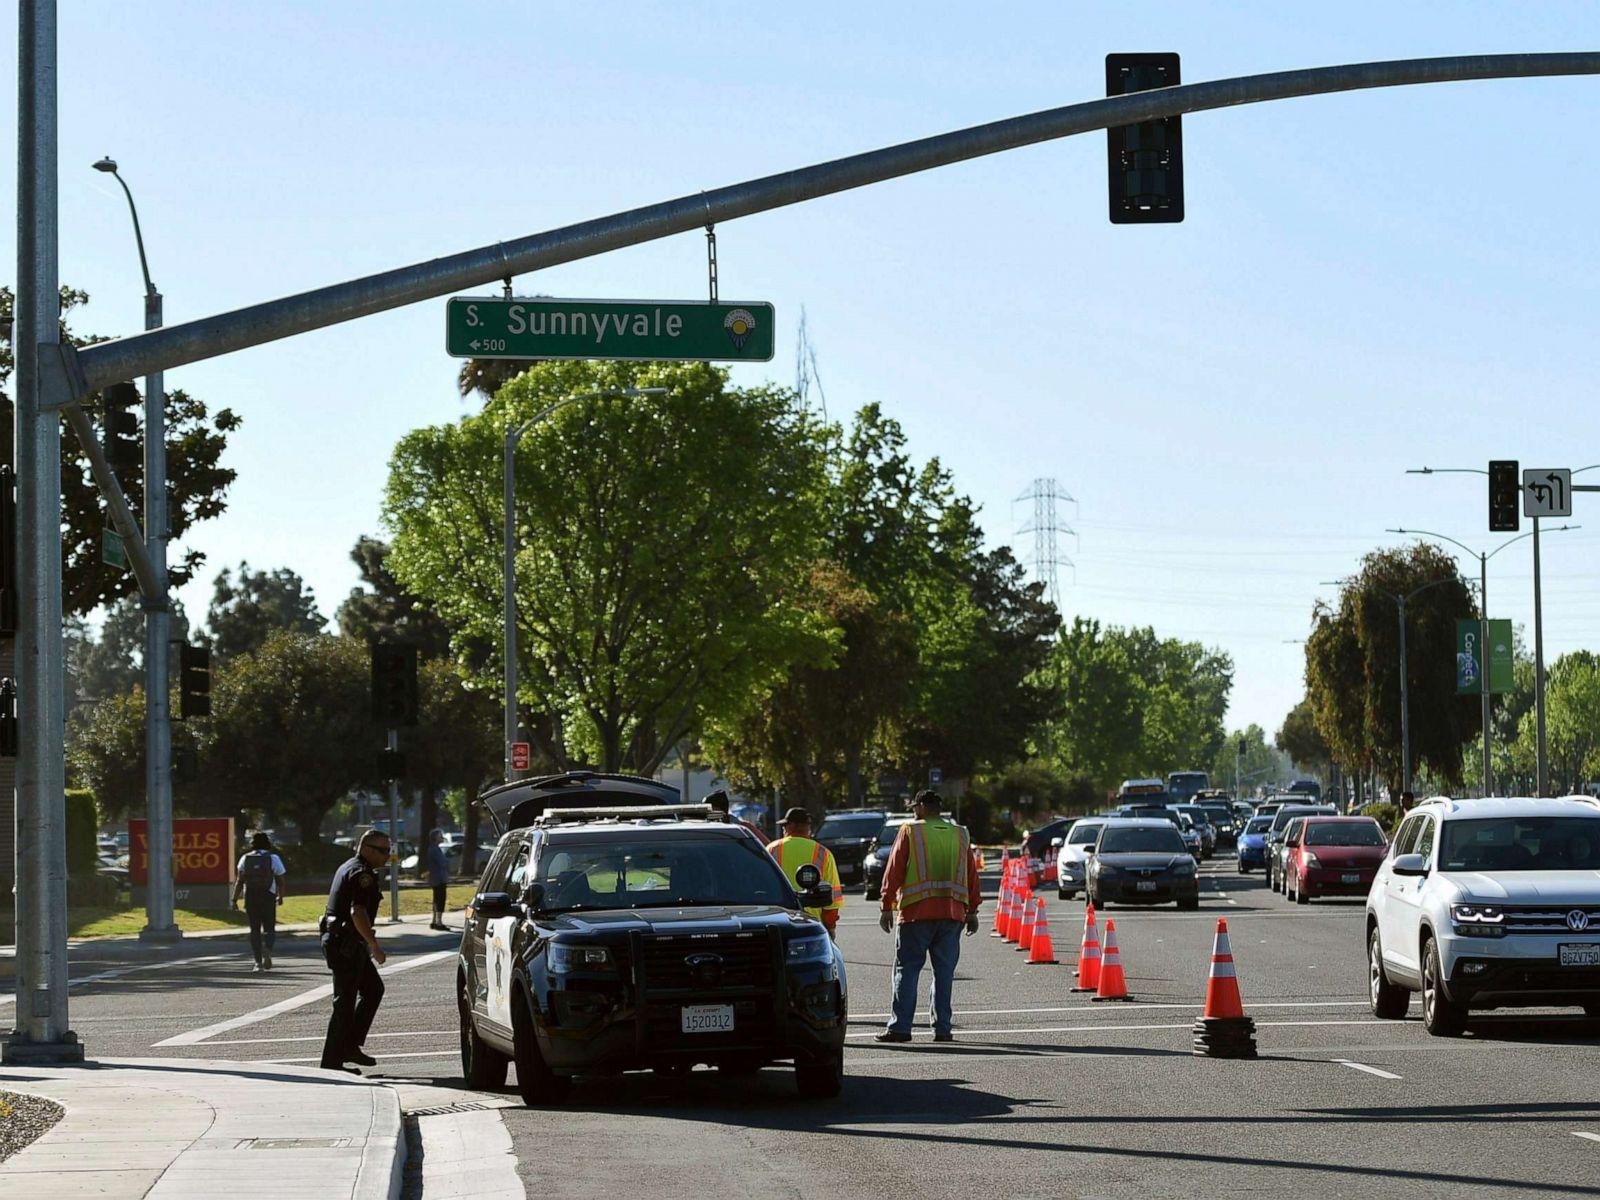 Man arrested in California ramming crash that injured 8 was Iraq war